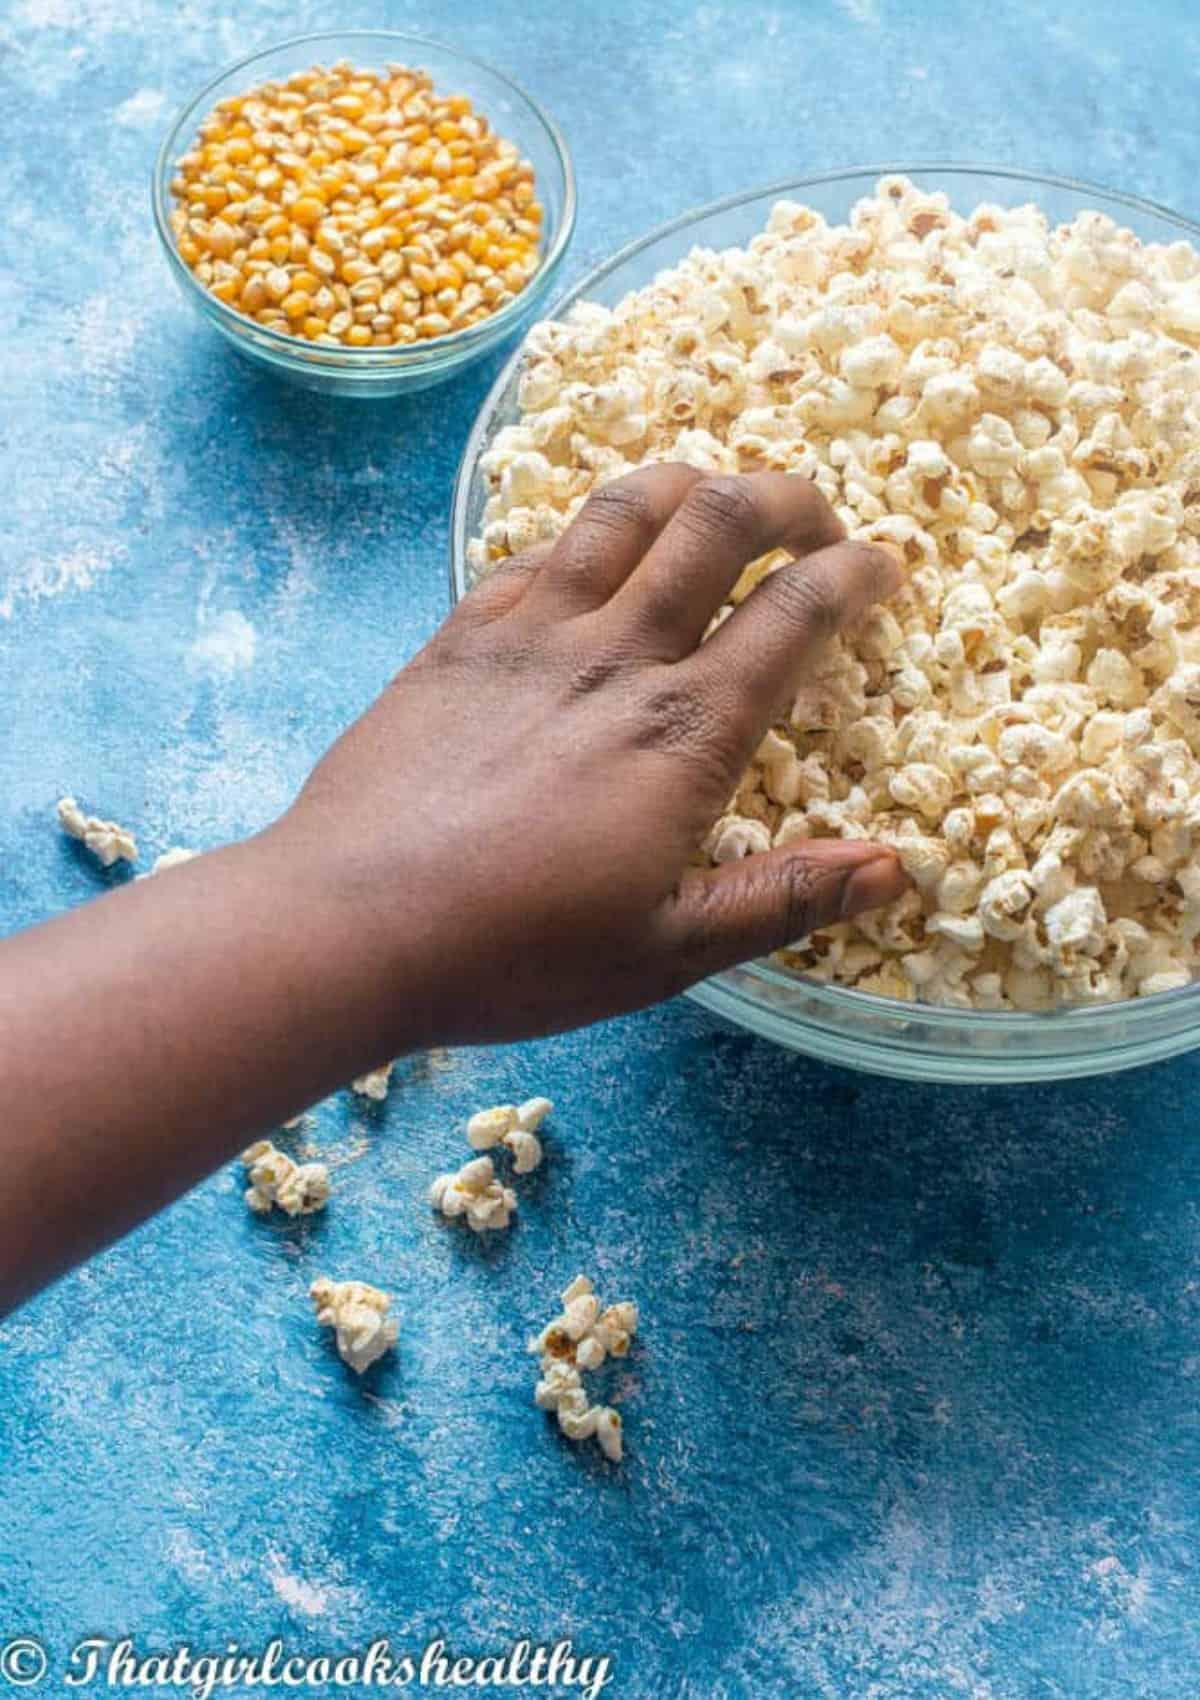 hand touching the popcorn